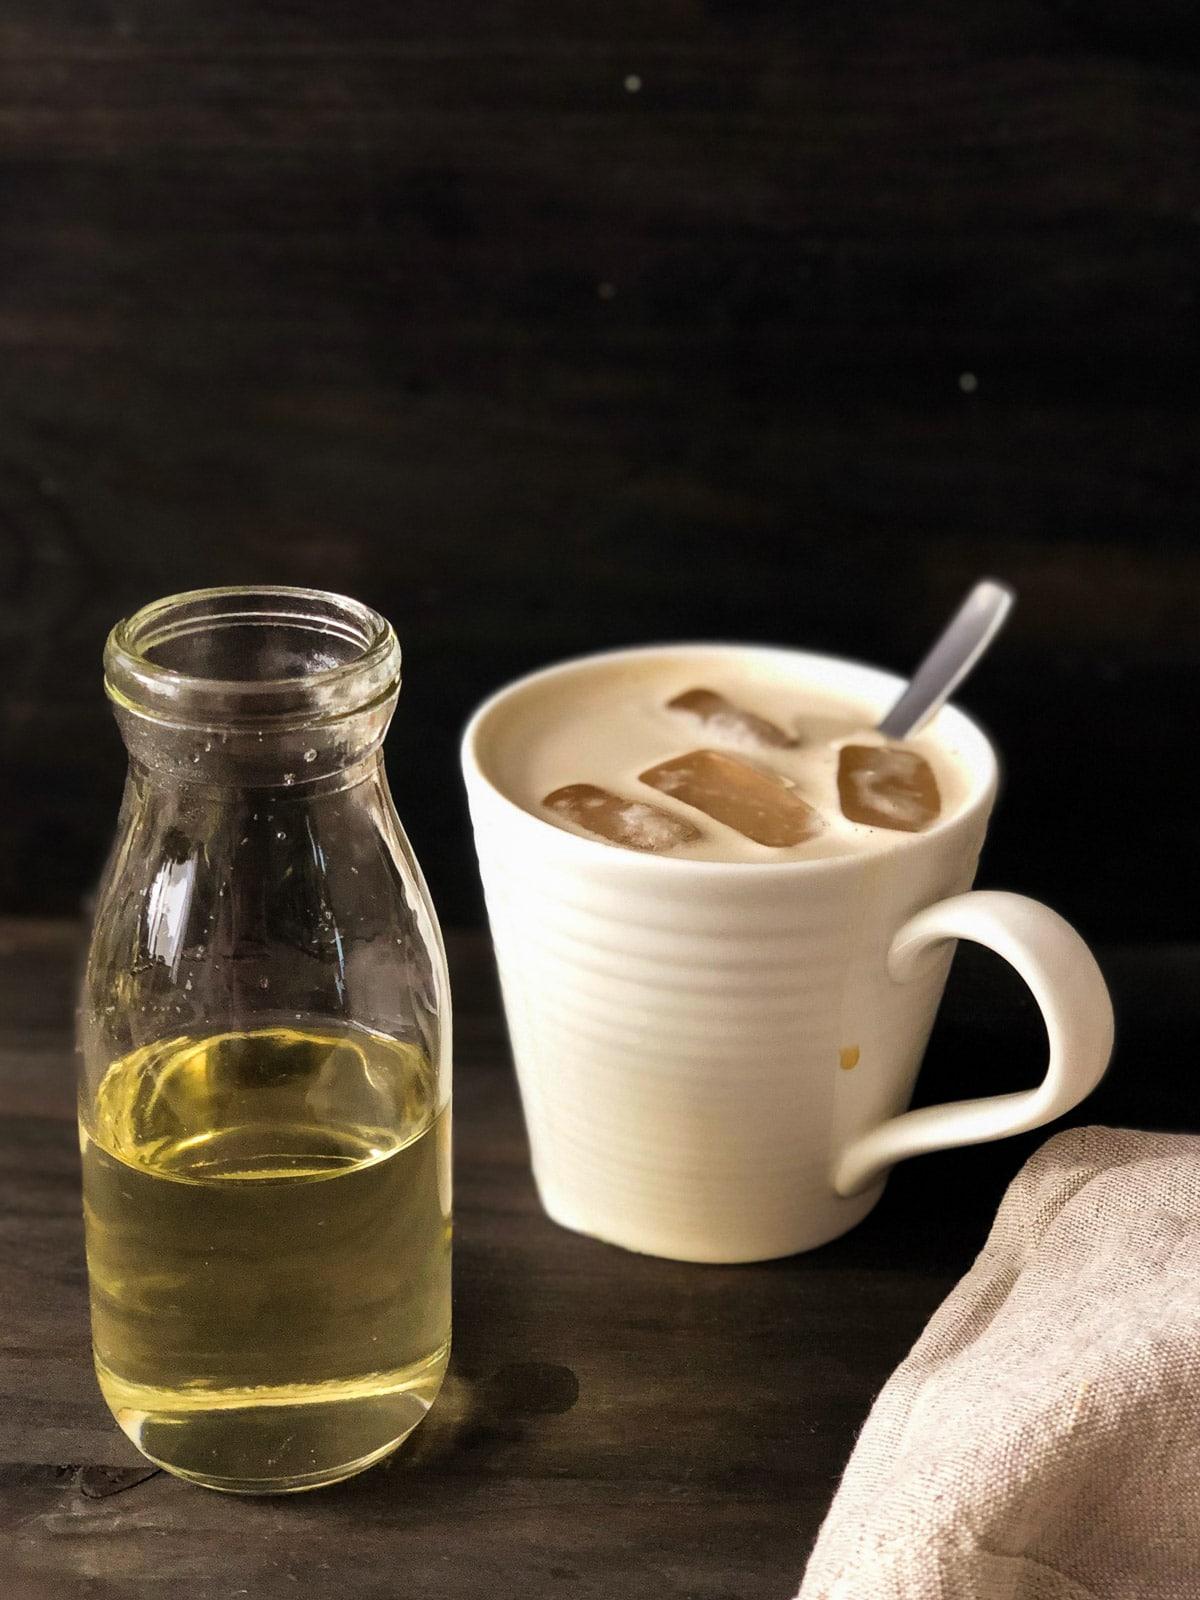 microwave Simple Syrup Recipe